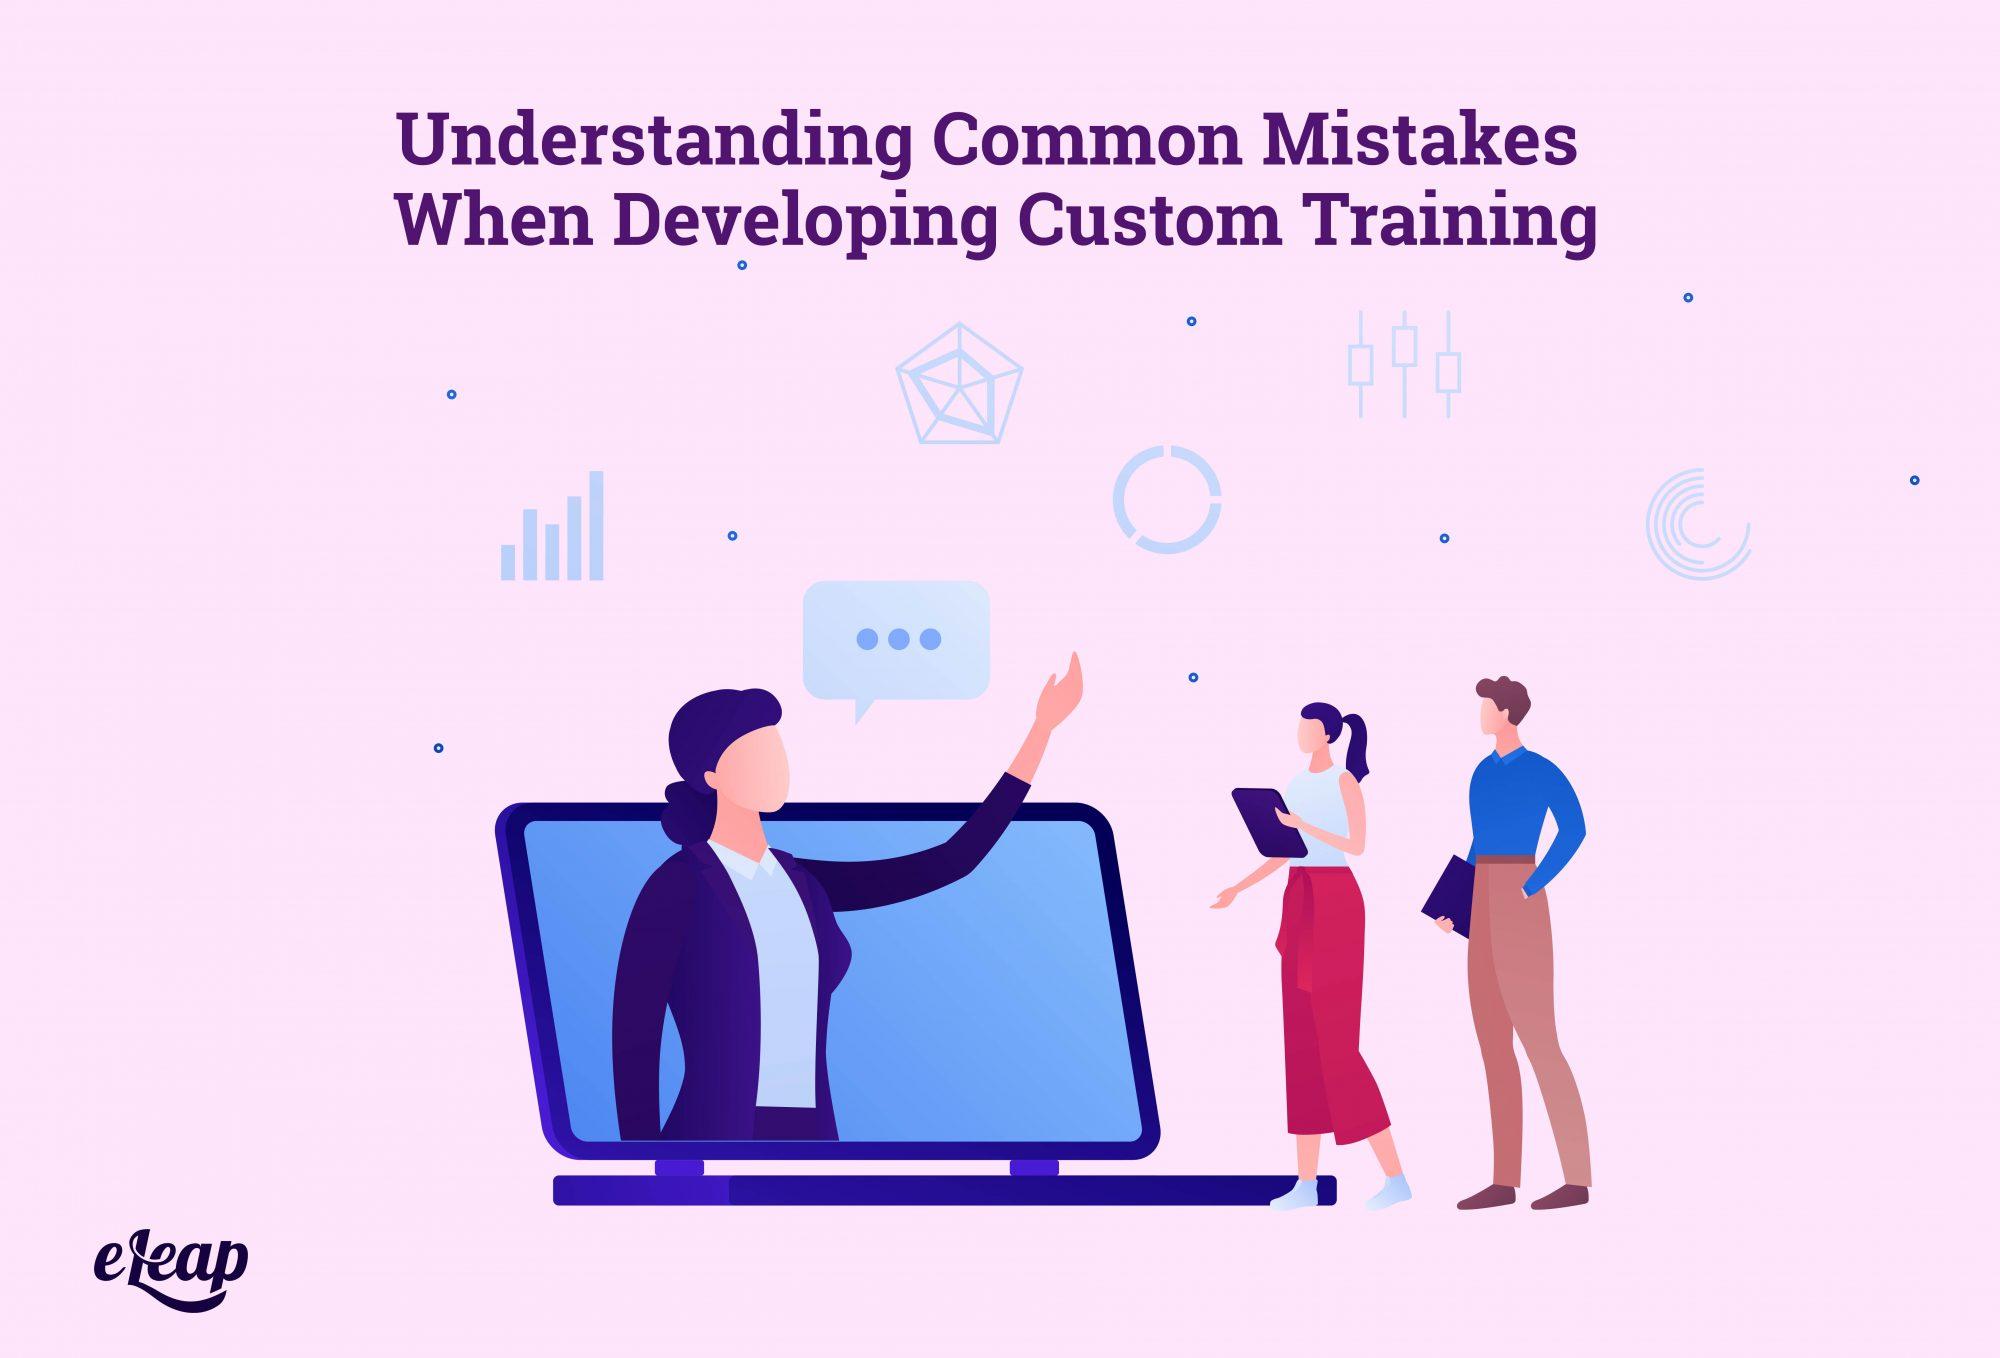 Understanding Common Mistakes When Developing Custom Training